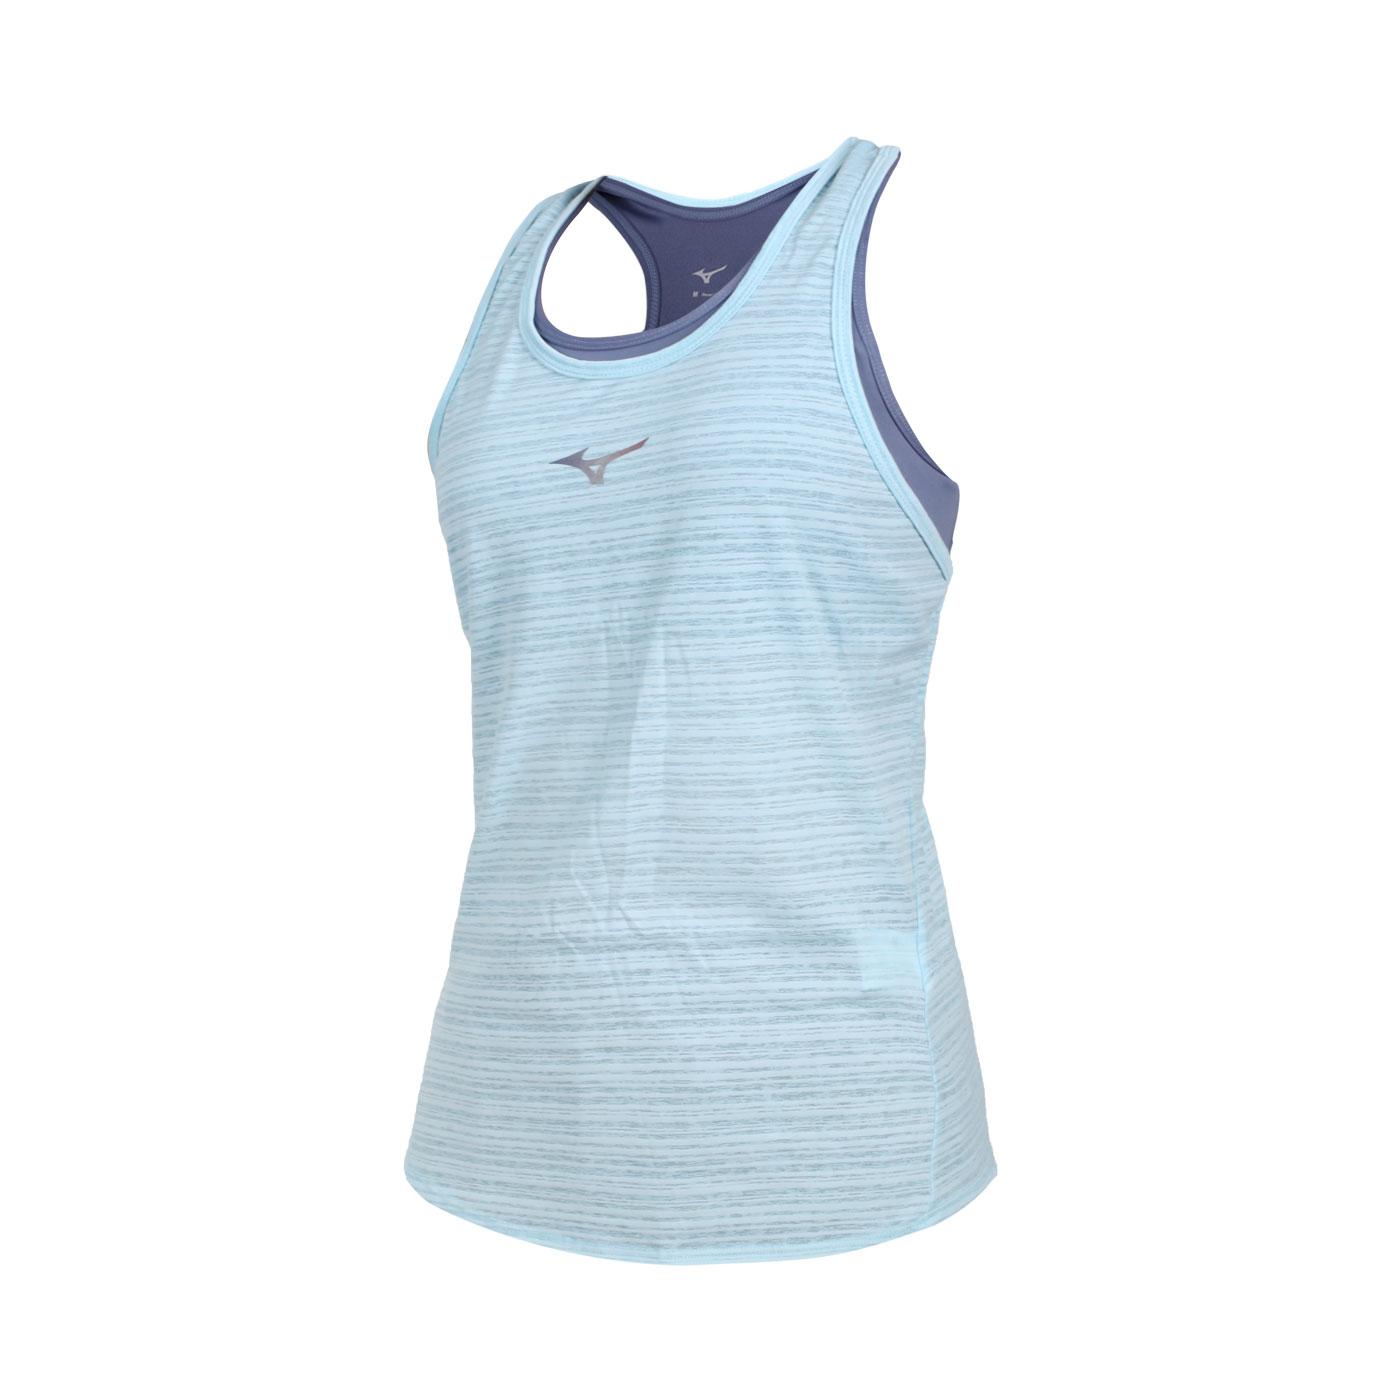 MIZUNO 女款兩件式瑜珈背心 K2TA120423 - 藍水藍銀